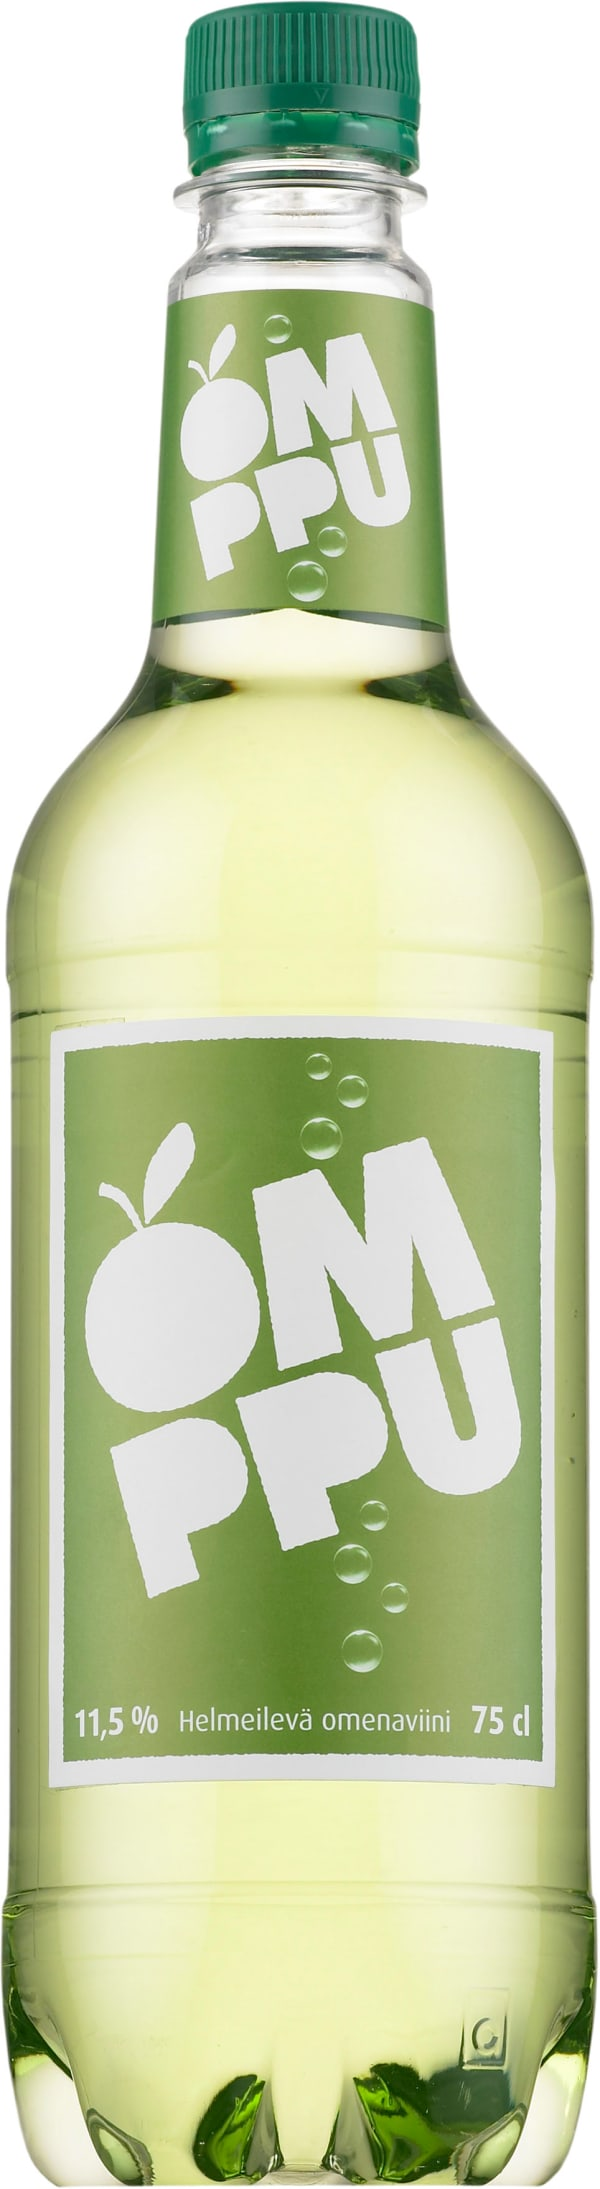 Omppu Helmeilevä Omenaviini plastflaska